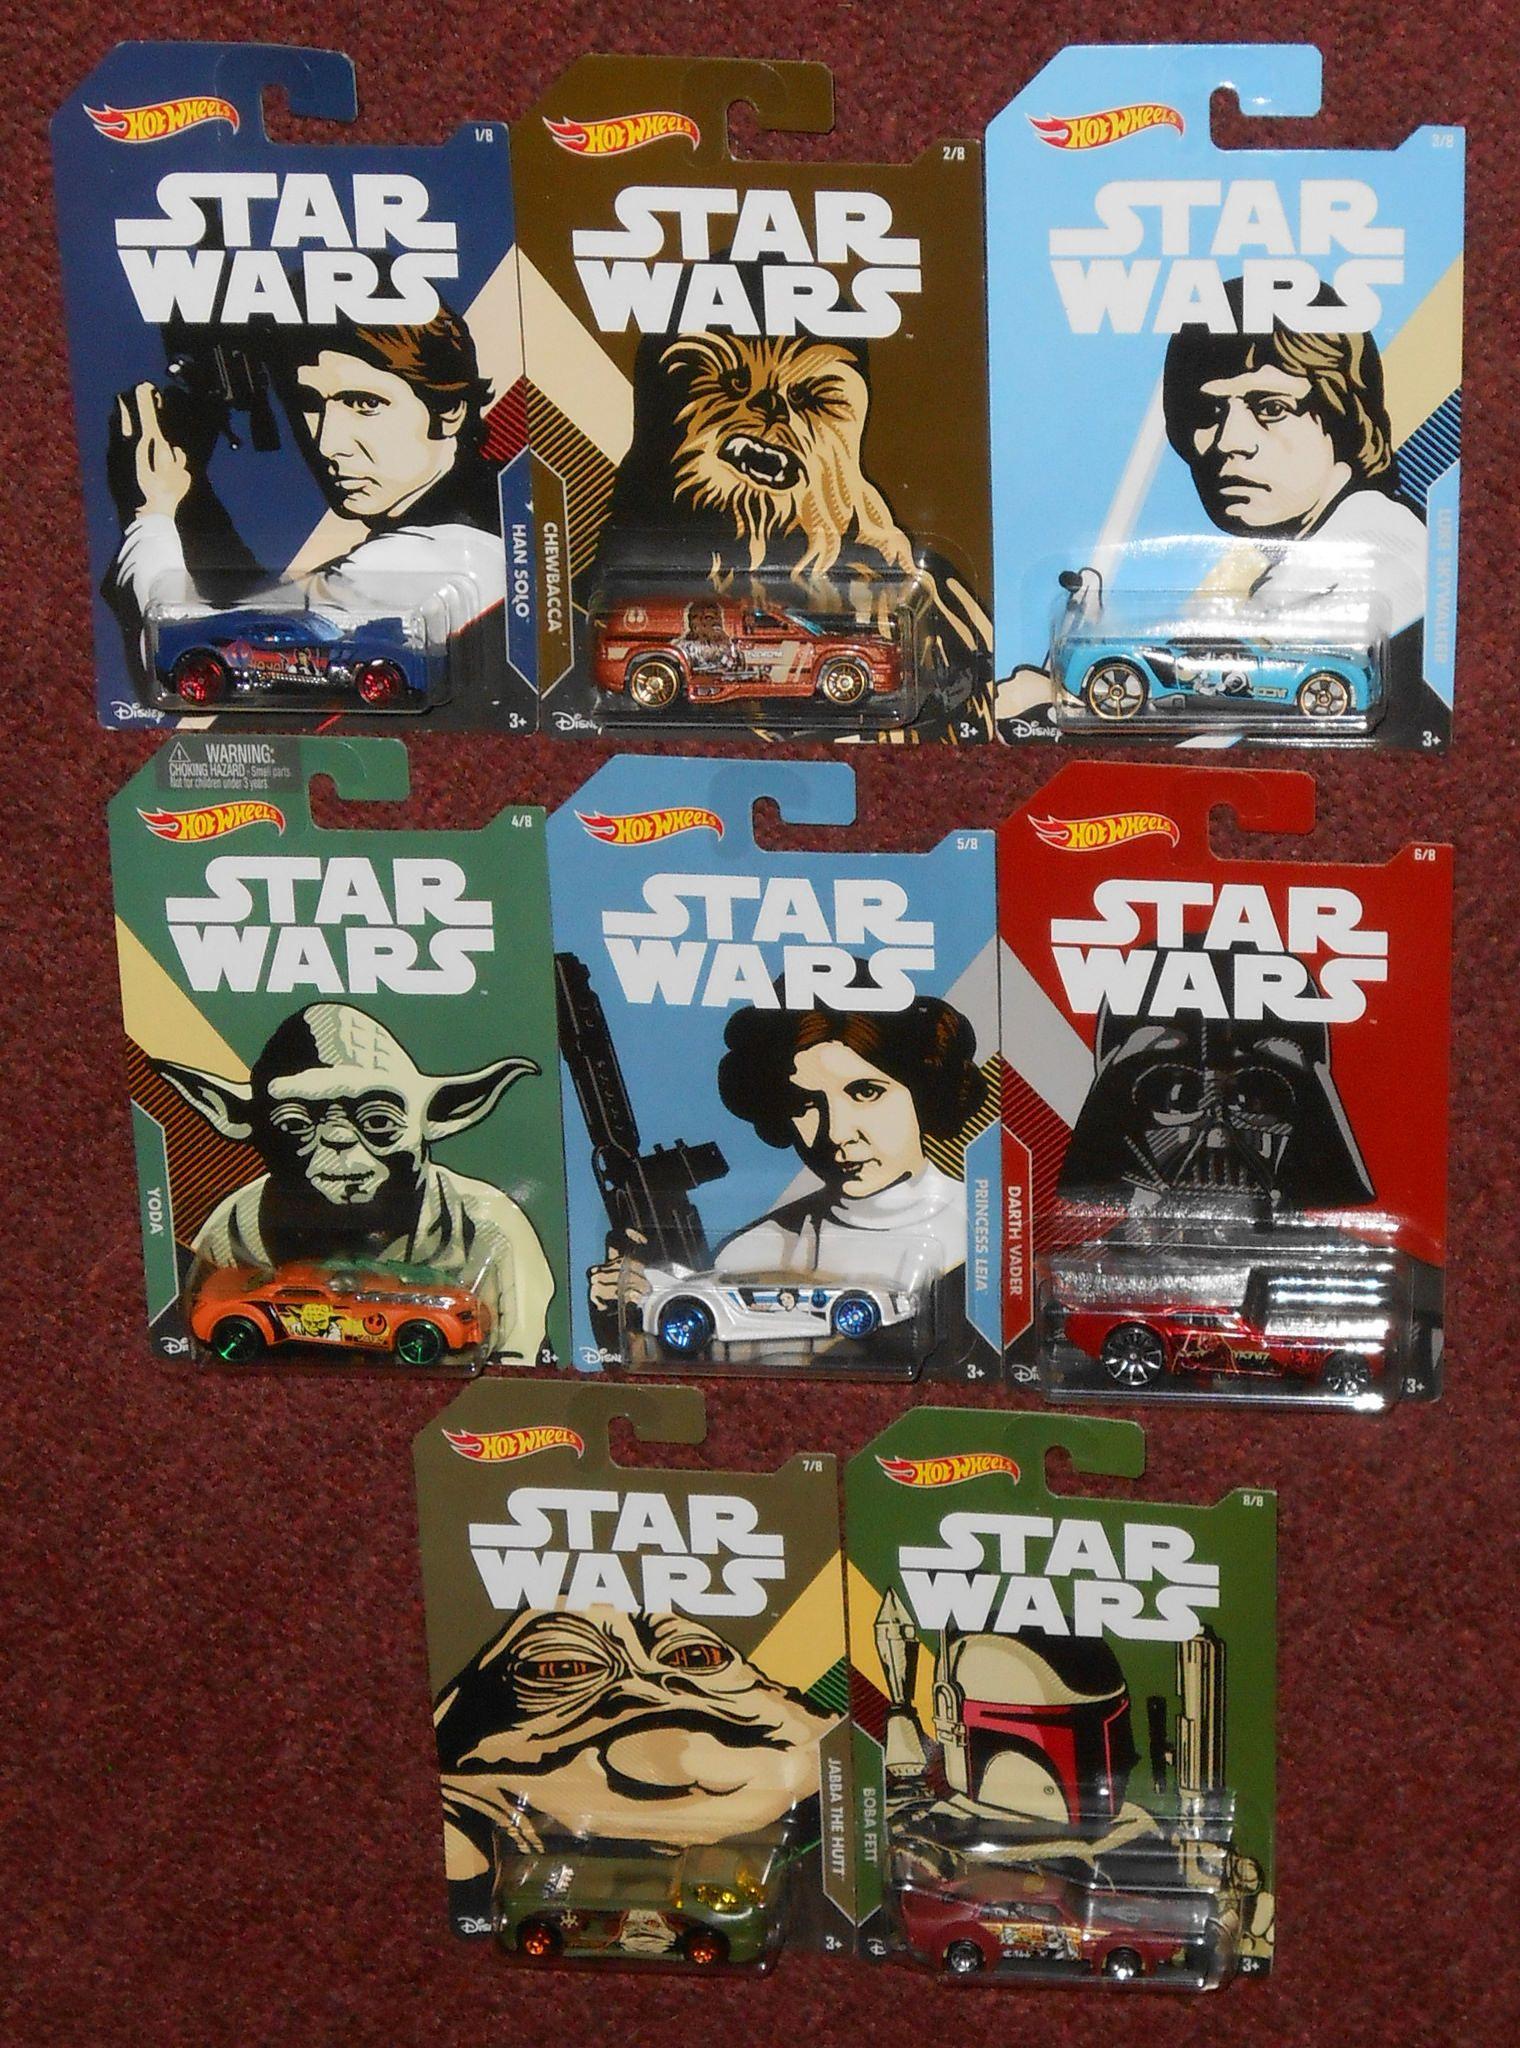 B toys car wheel  Hot Wheels  Star Wars Cars  My Star Wars Pics  Pinterest  Luke